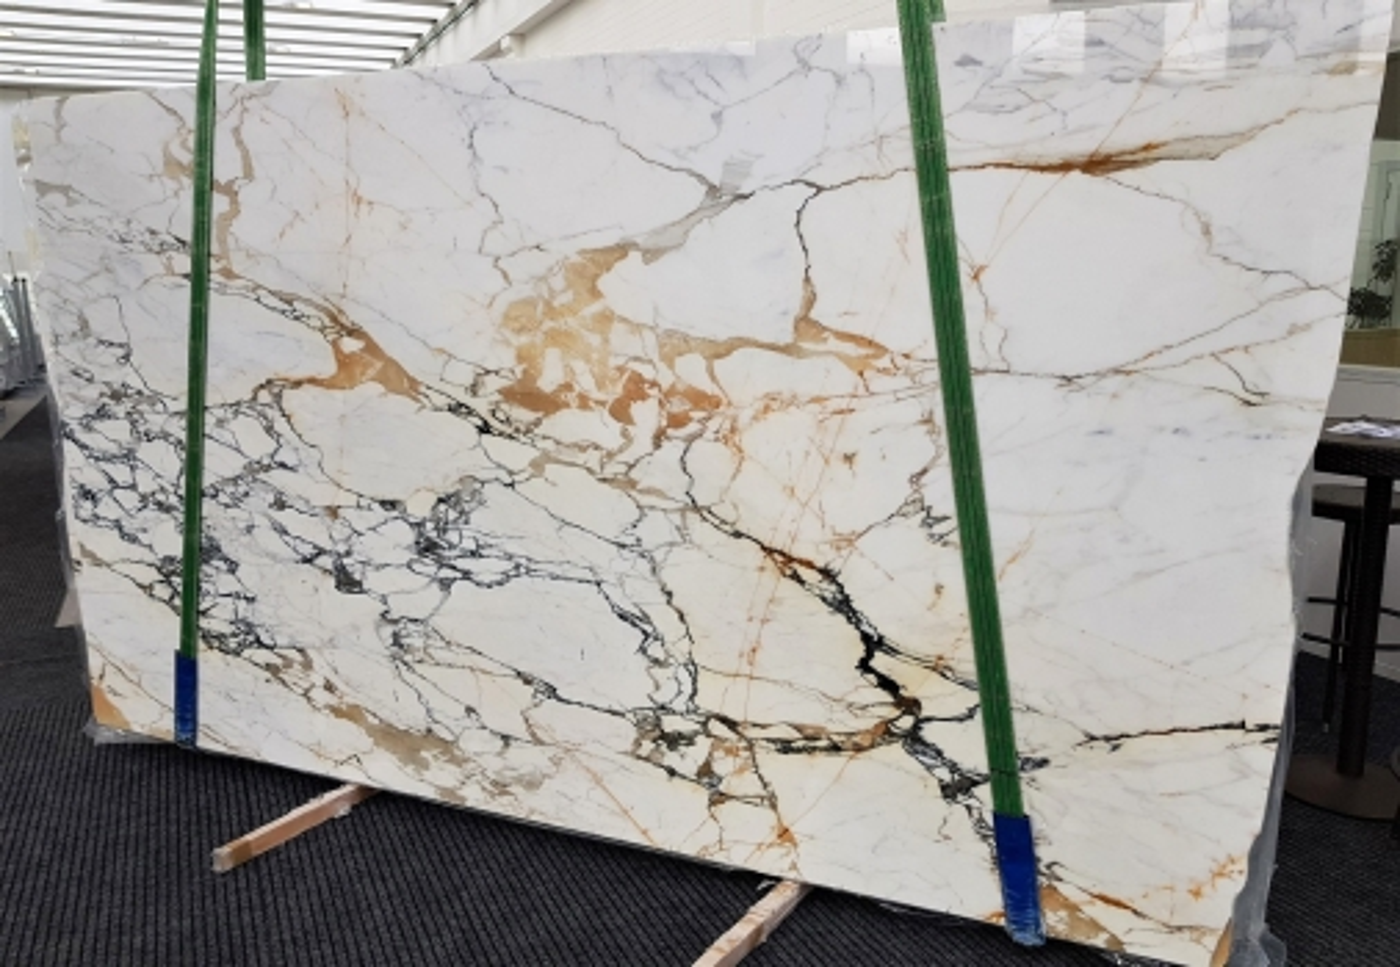 CALACATTA MACCHIAVECCHIA Suministro (Italia) de planchas pulidas en mármol natural GL 1131 , Bundle #1